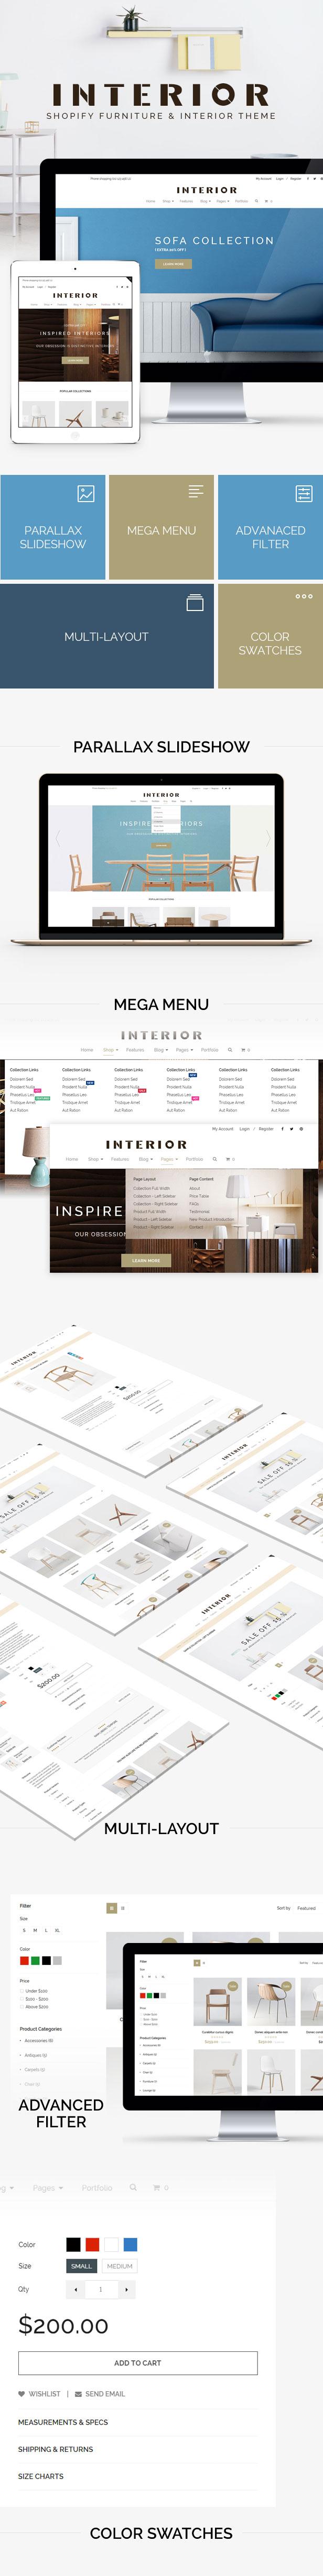 Minimalist Interior & Furniture Shopify Theme